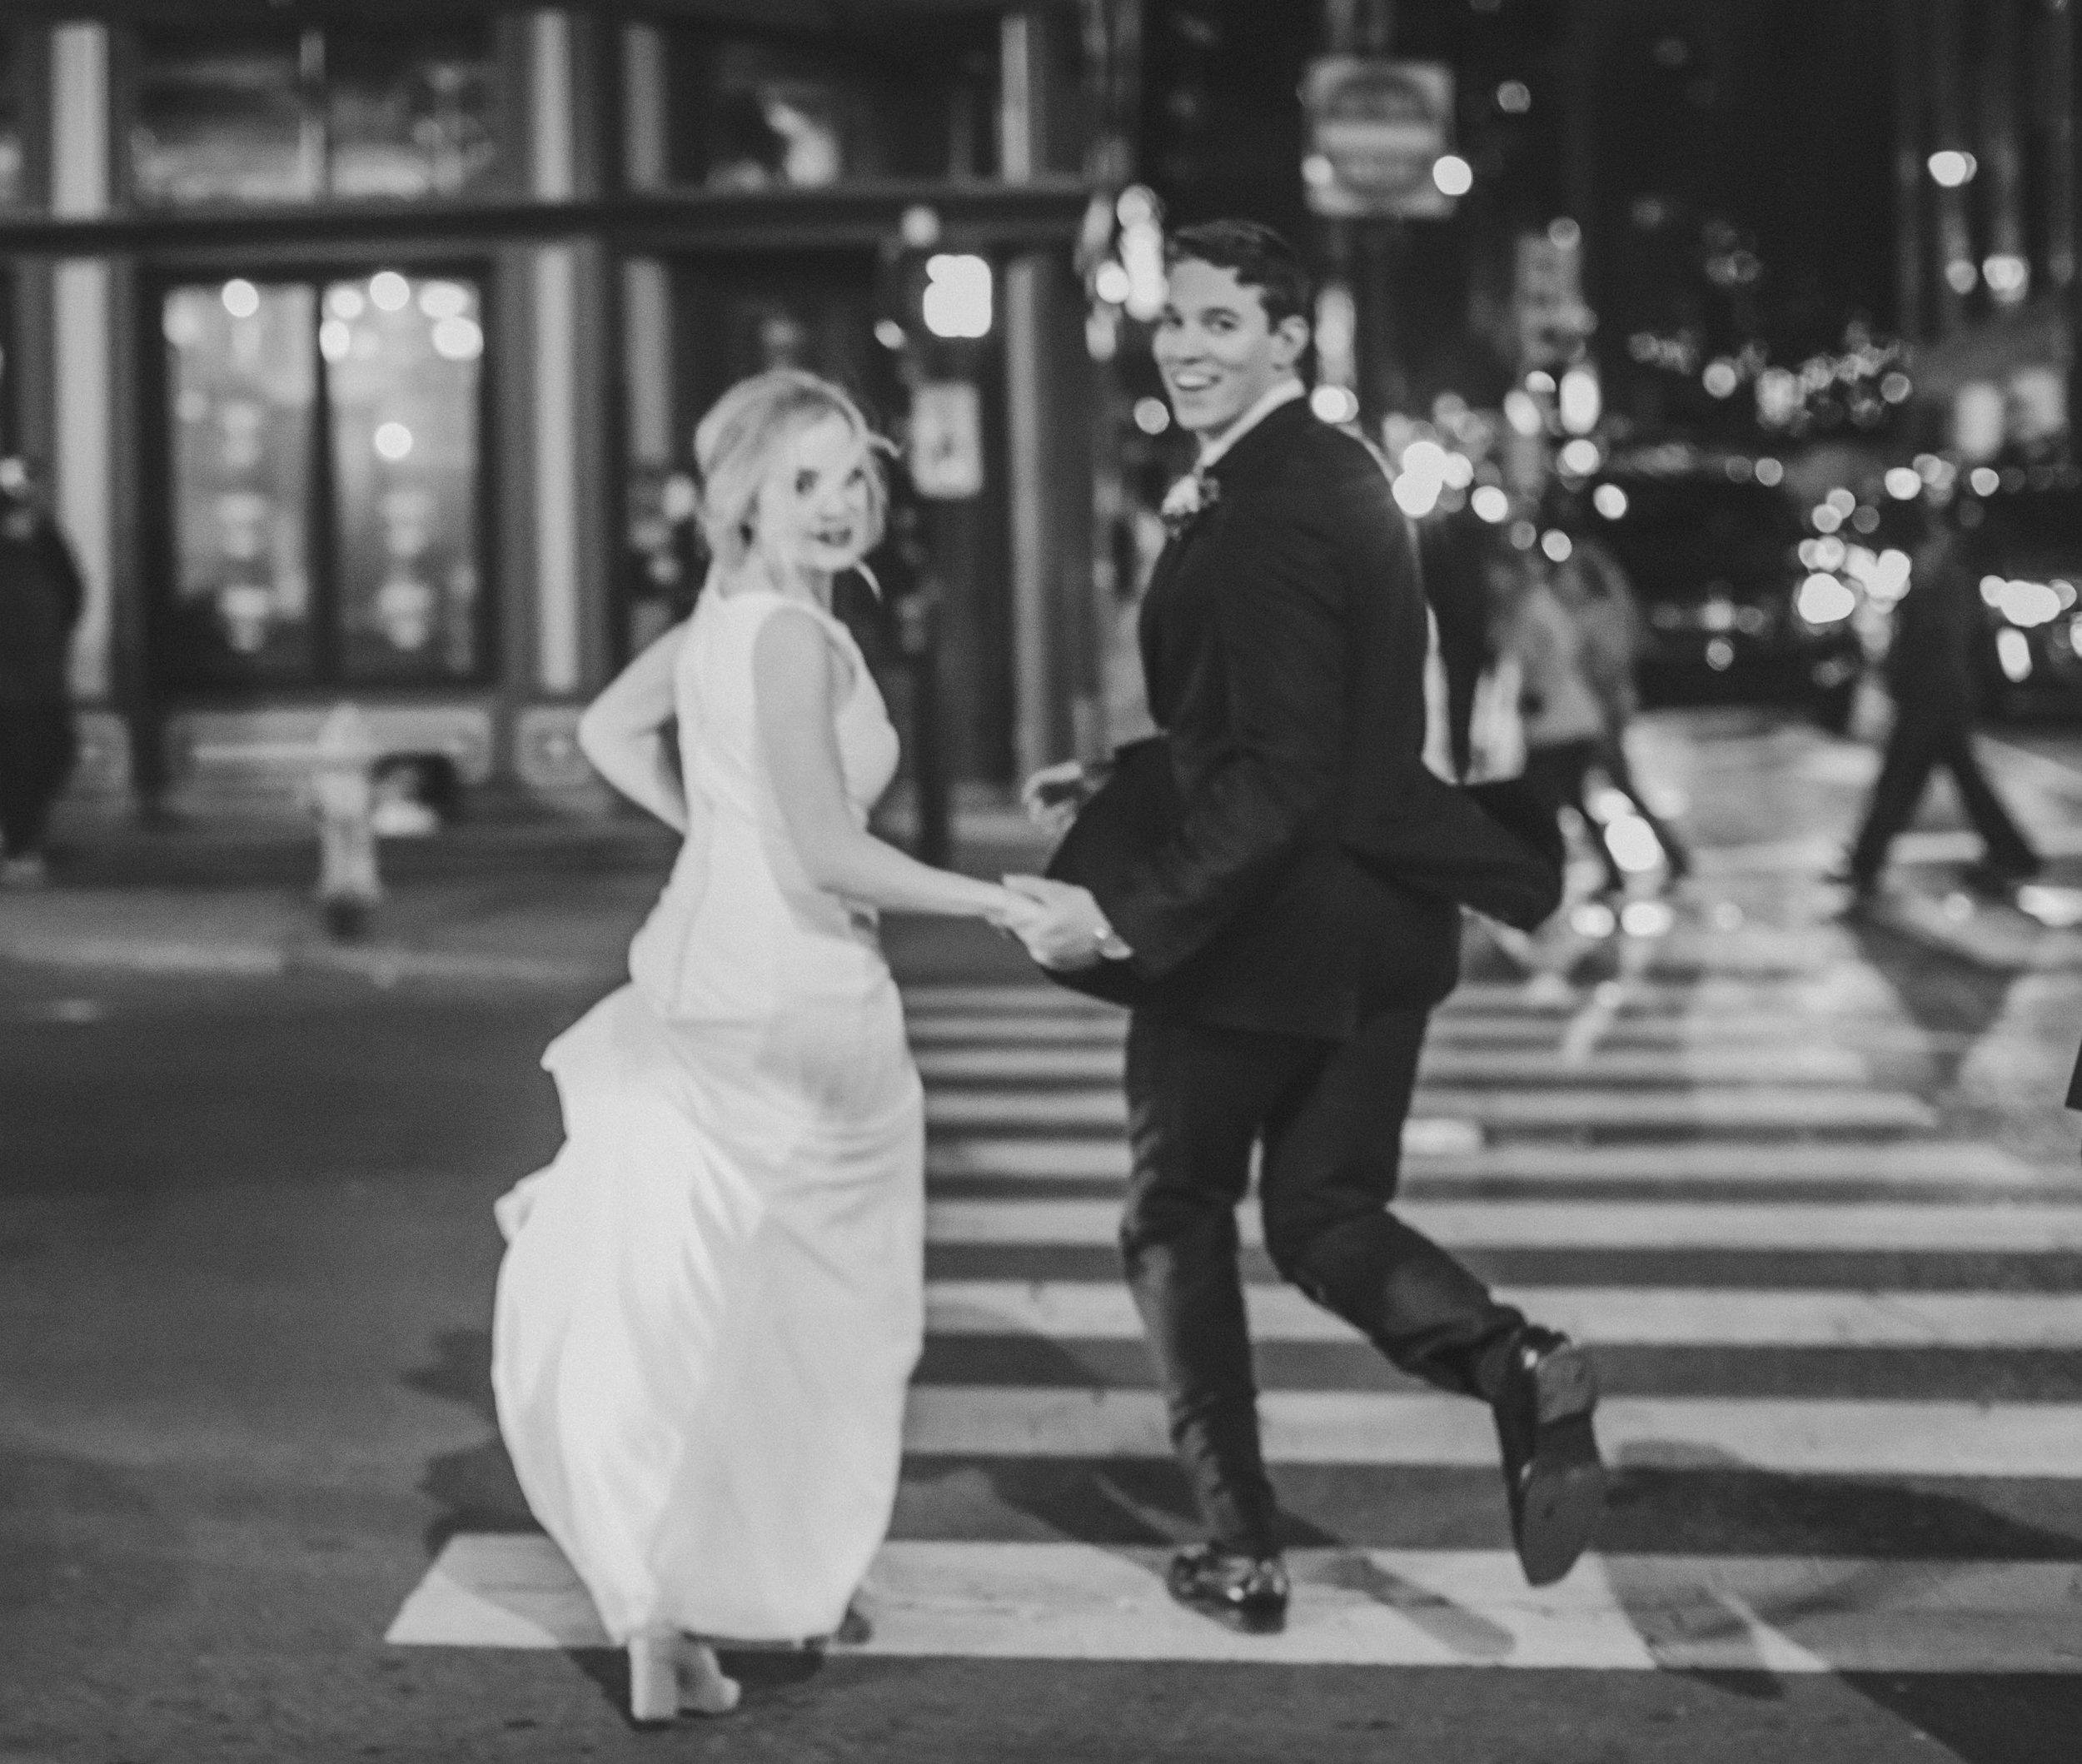 Charis_Lauren_Romantic_Wedding_Photographer_Nashville_03A0213-2.jpg